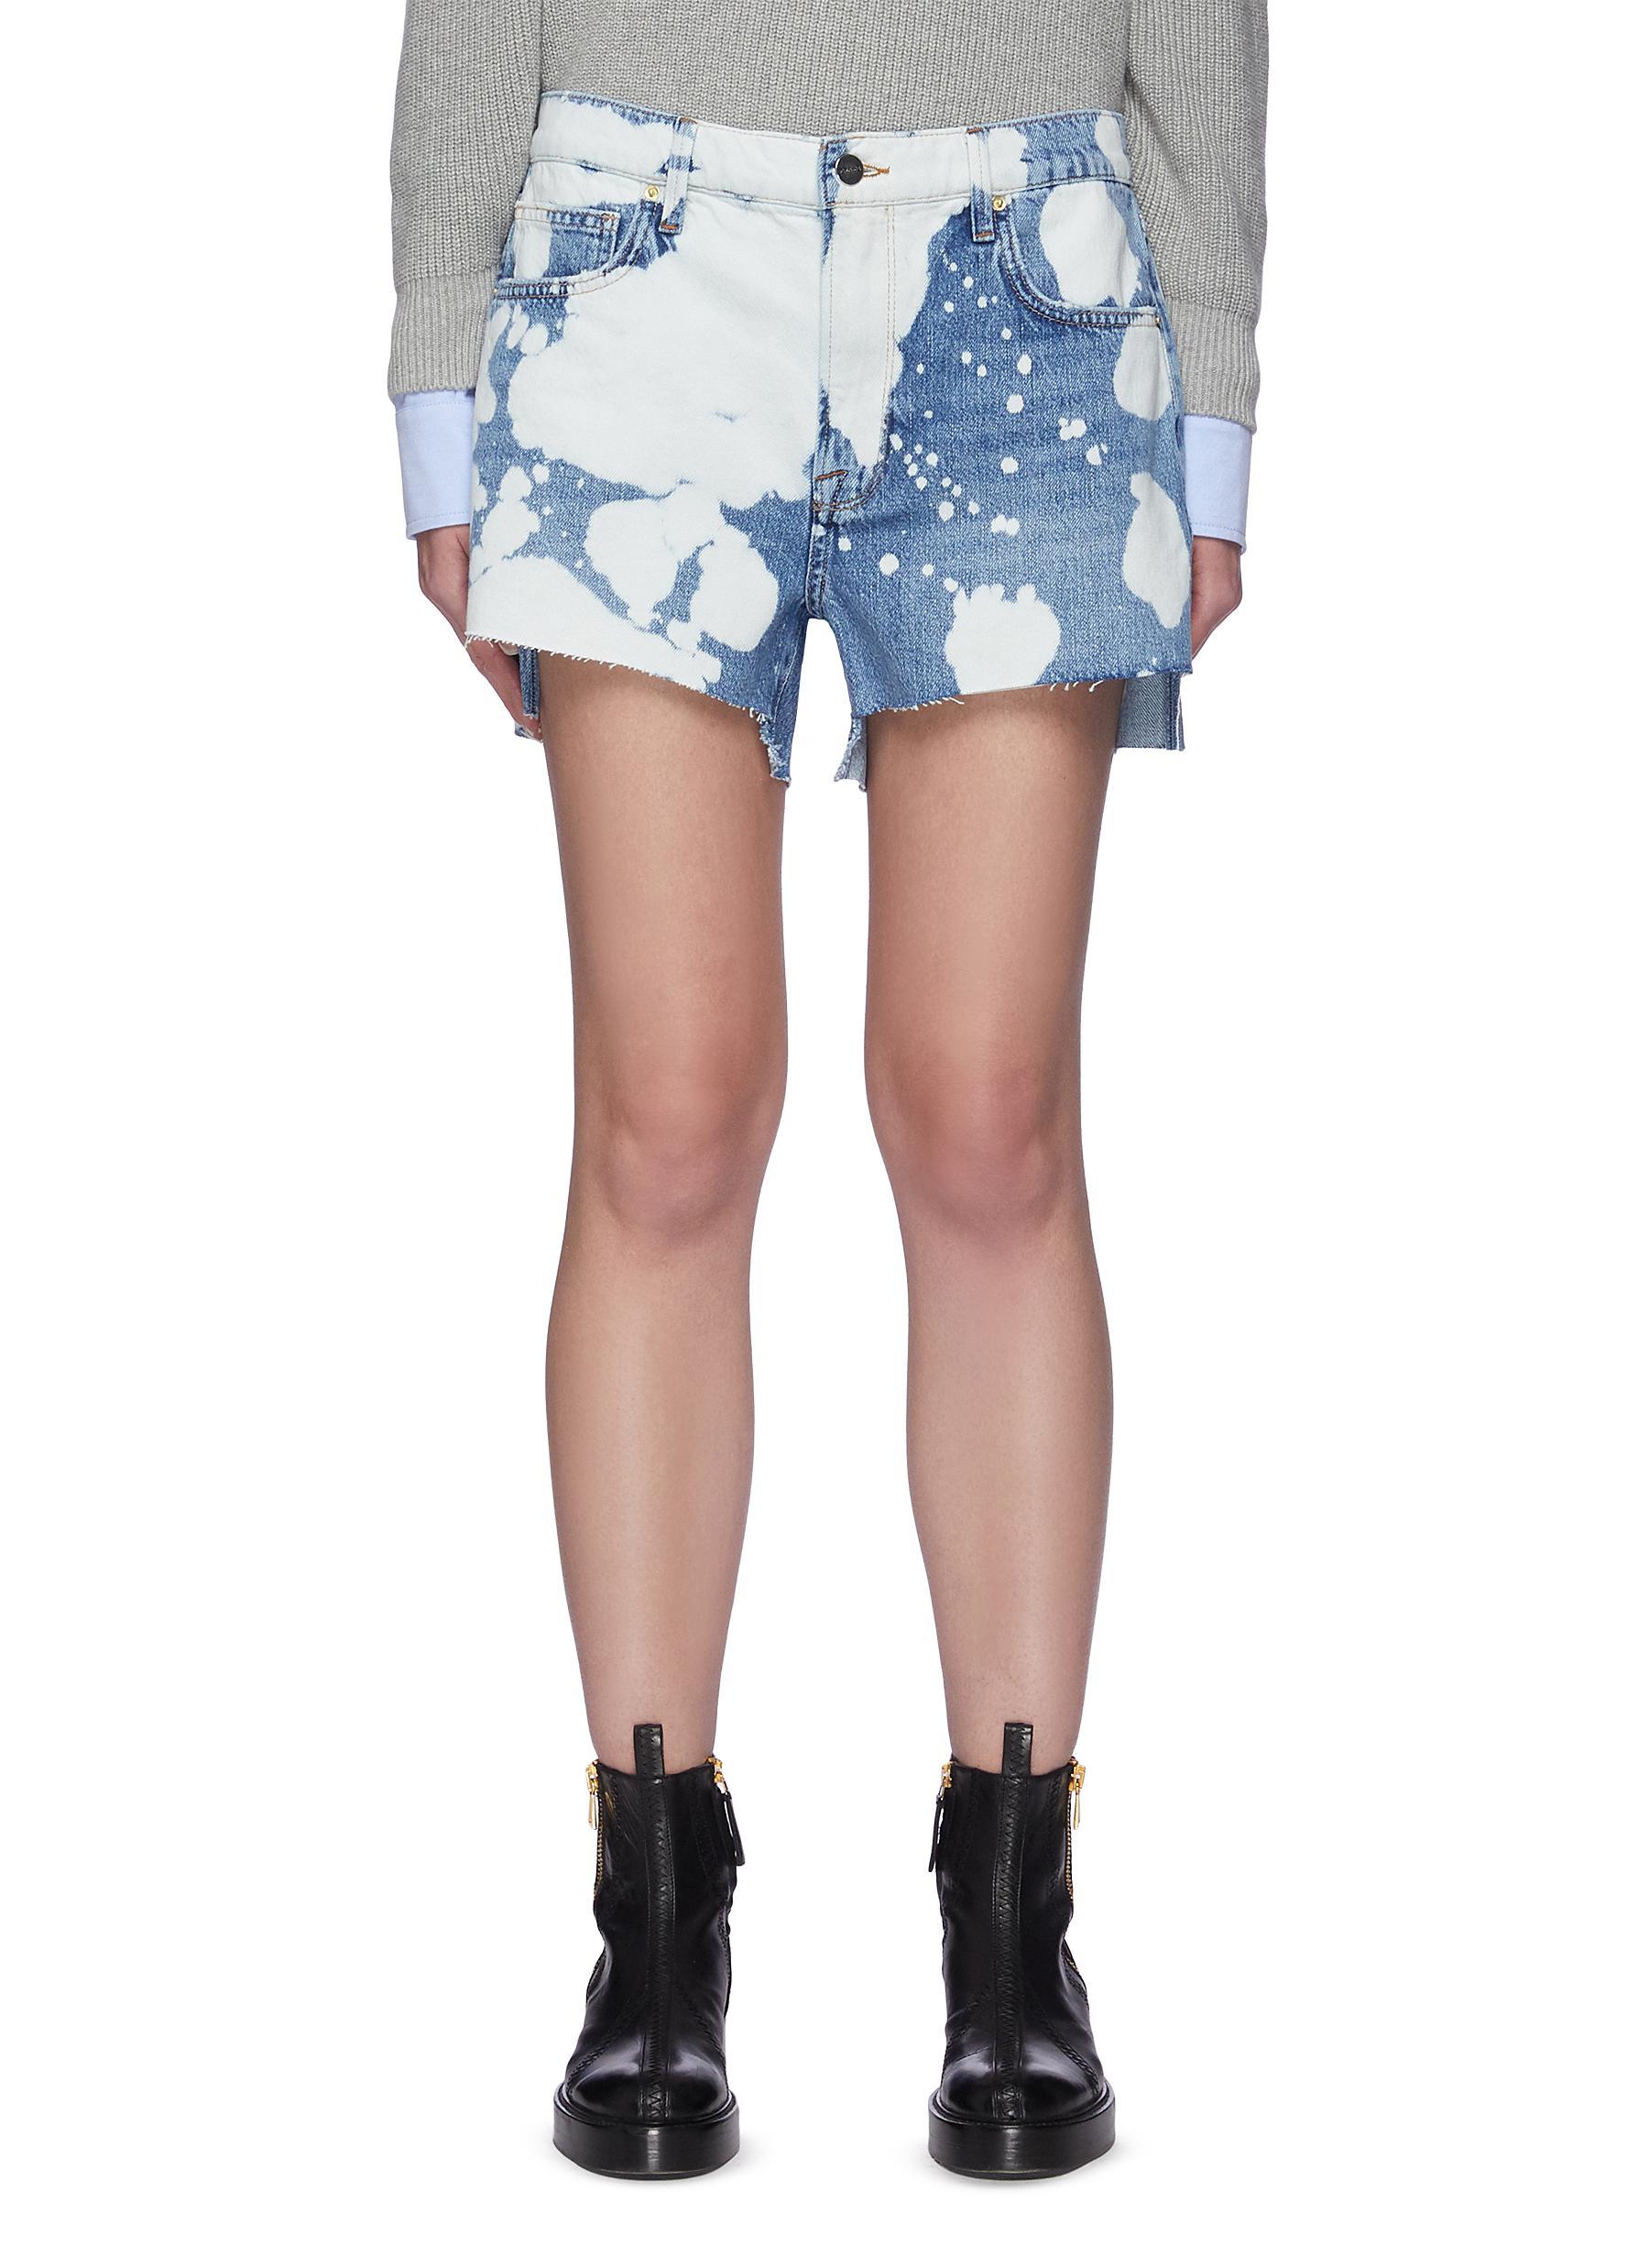 Le Ultra' Paint Splatter Pattern Duo-tone Denim Shorts